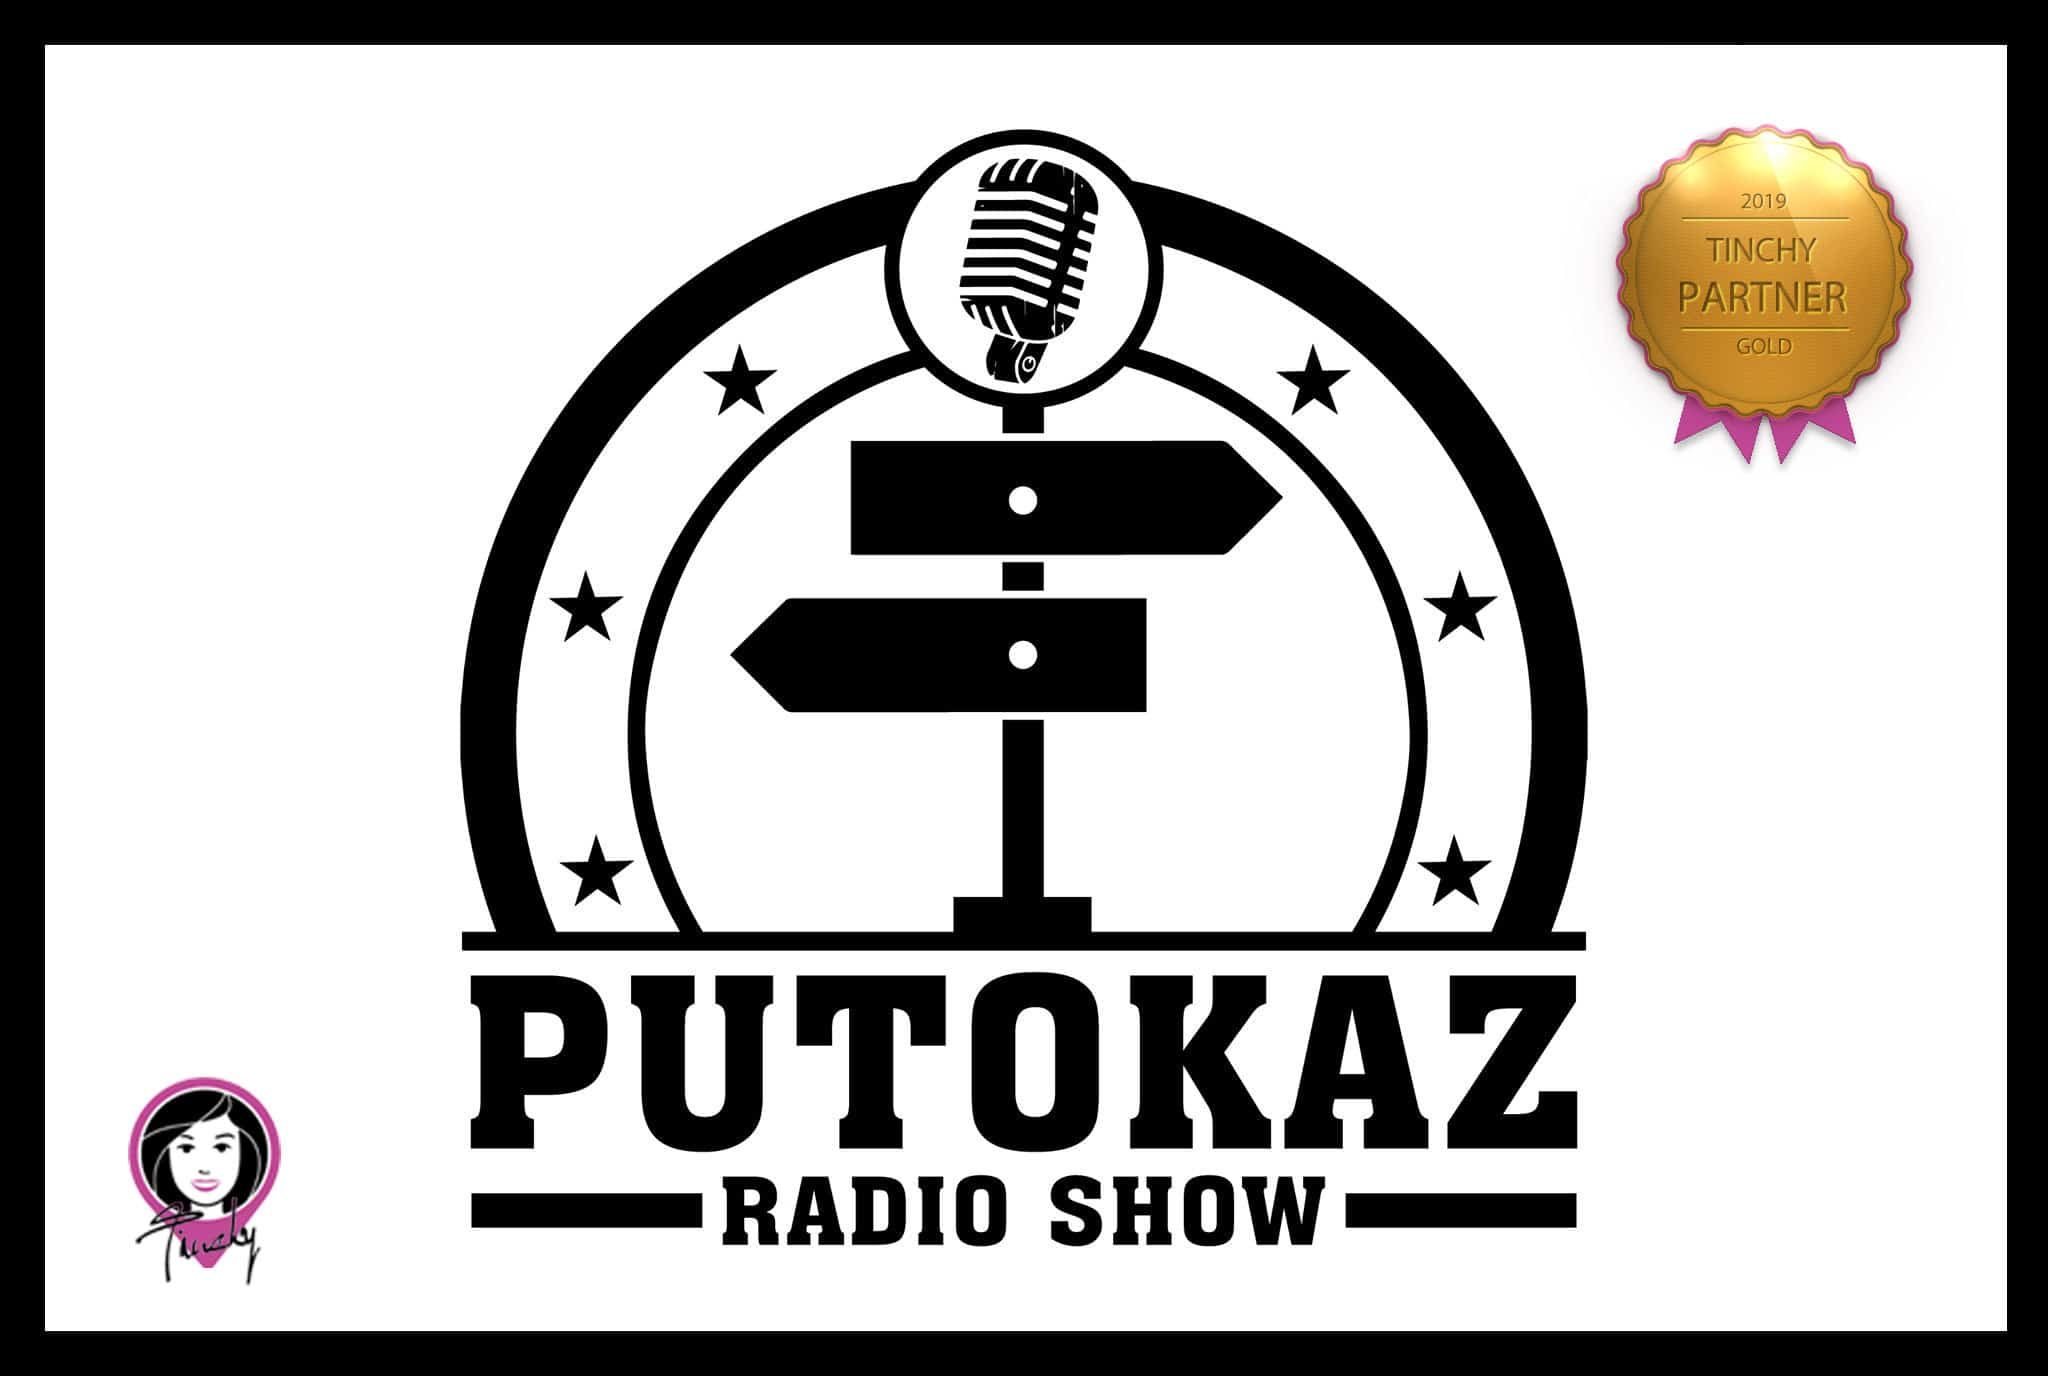 19.07.2019 – Radio emisija Putokaz